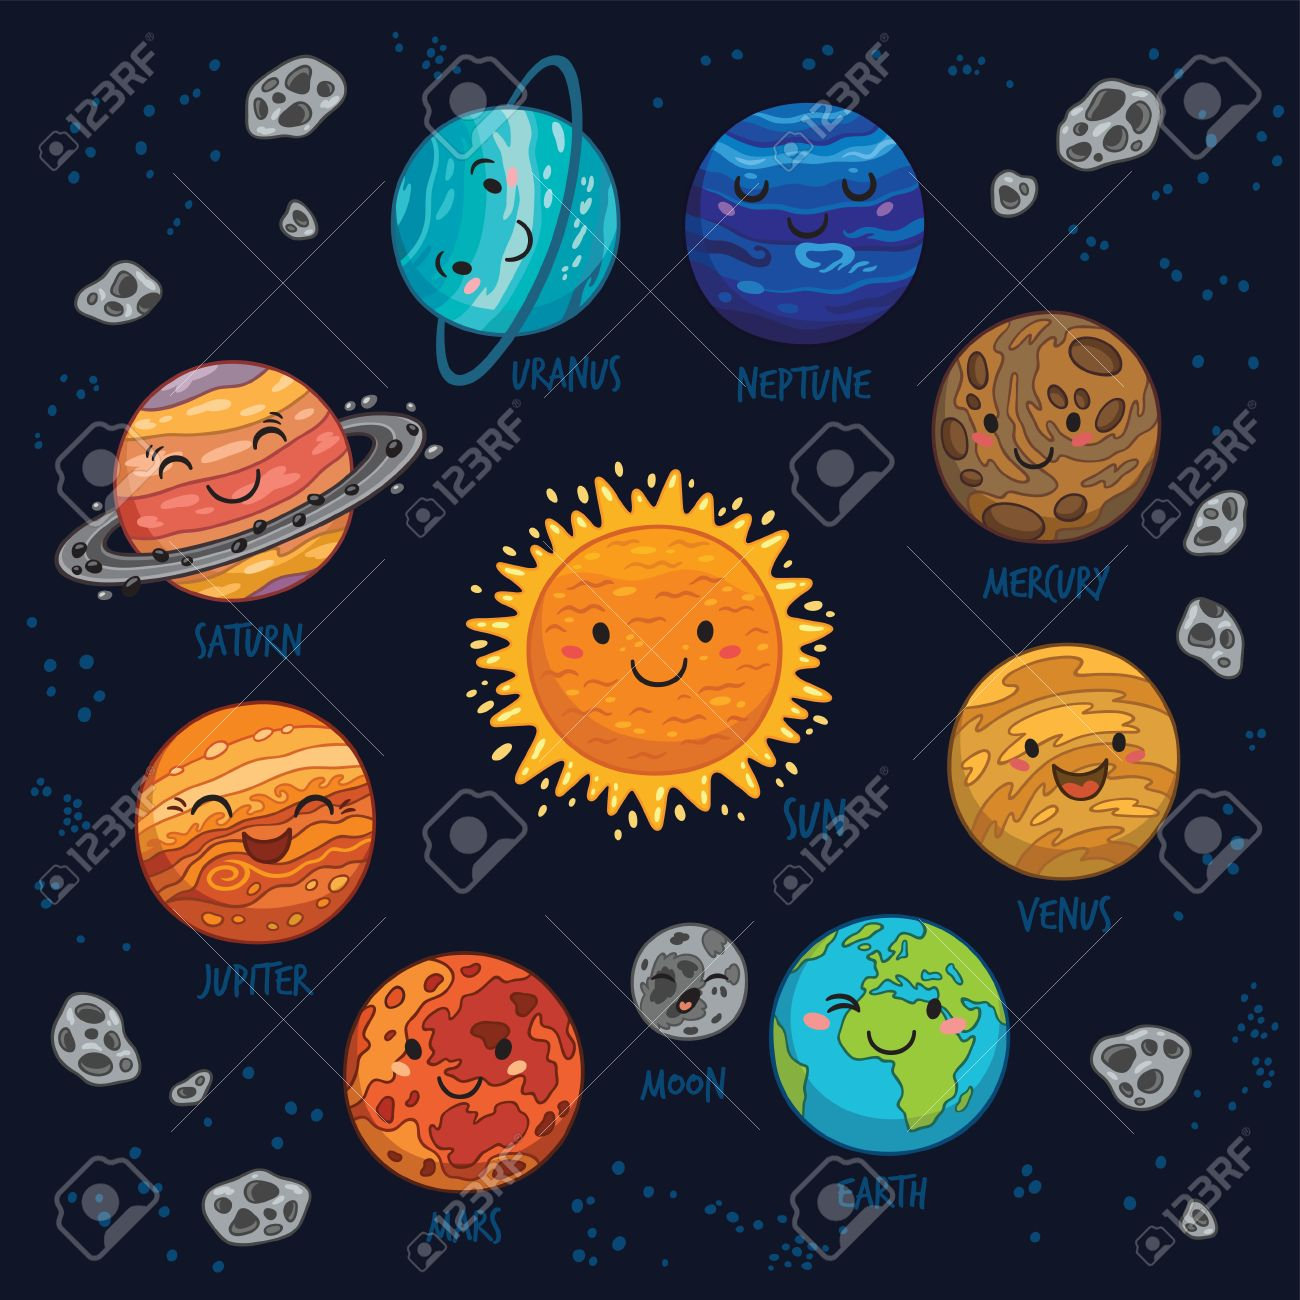 Cartoon planet of solar system - Sun, Mercury, Venus, Earth, Mars, Jupiter and Saturn, Uranus and Neptune. Planet vector set. Planets collection silhouette. - 58720394